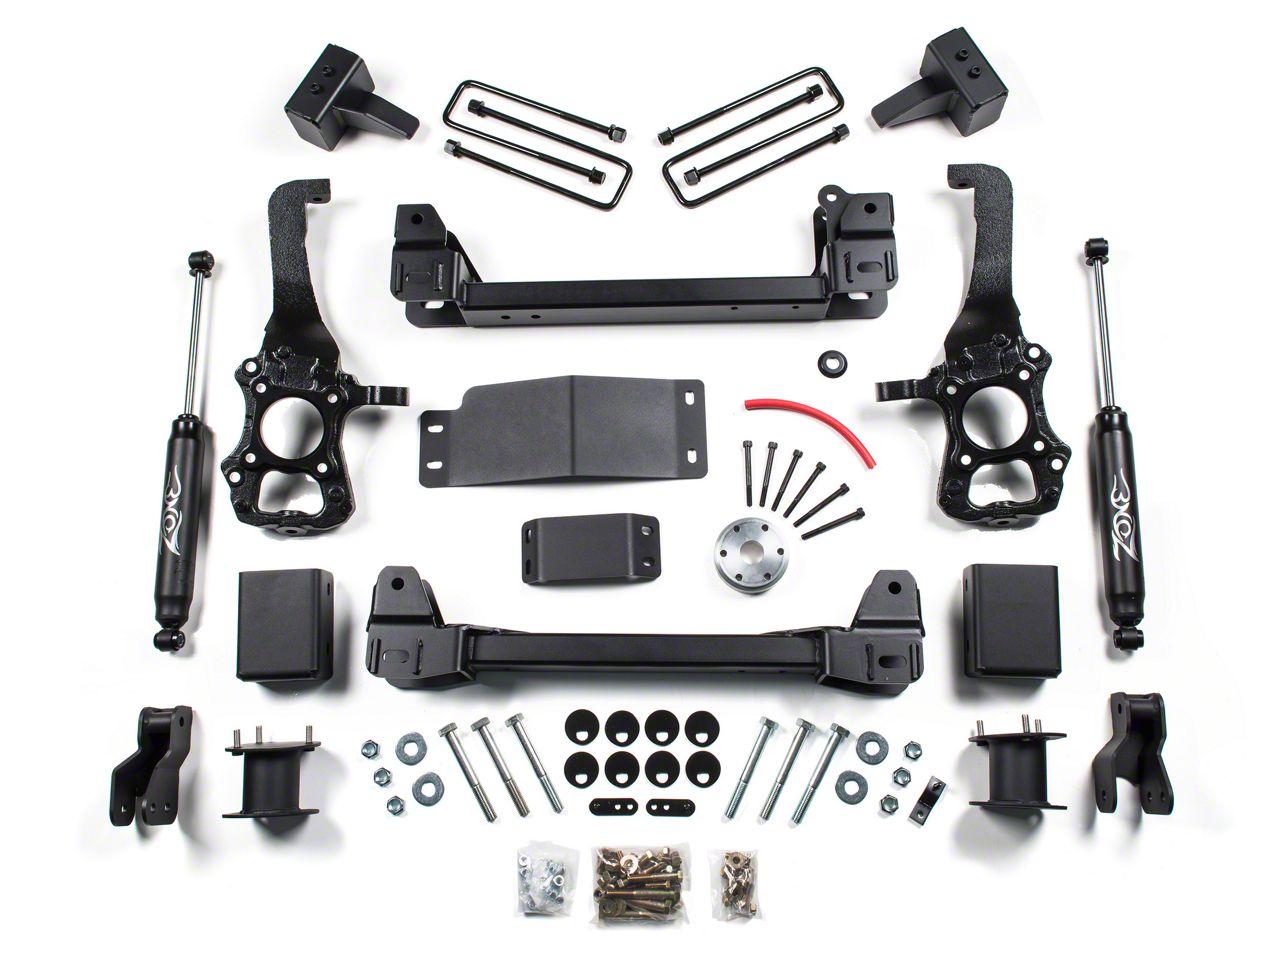 Zone Offroad 4 in. Suspension Lift Kit w/ Shocks (15-16 4WD F-150)